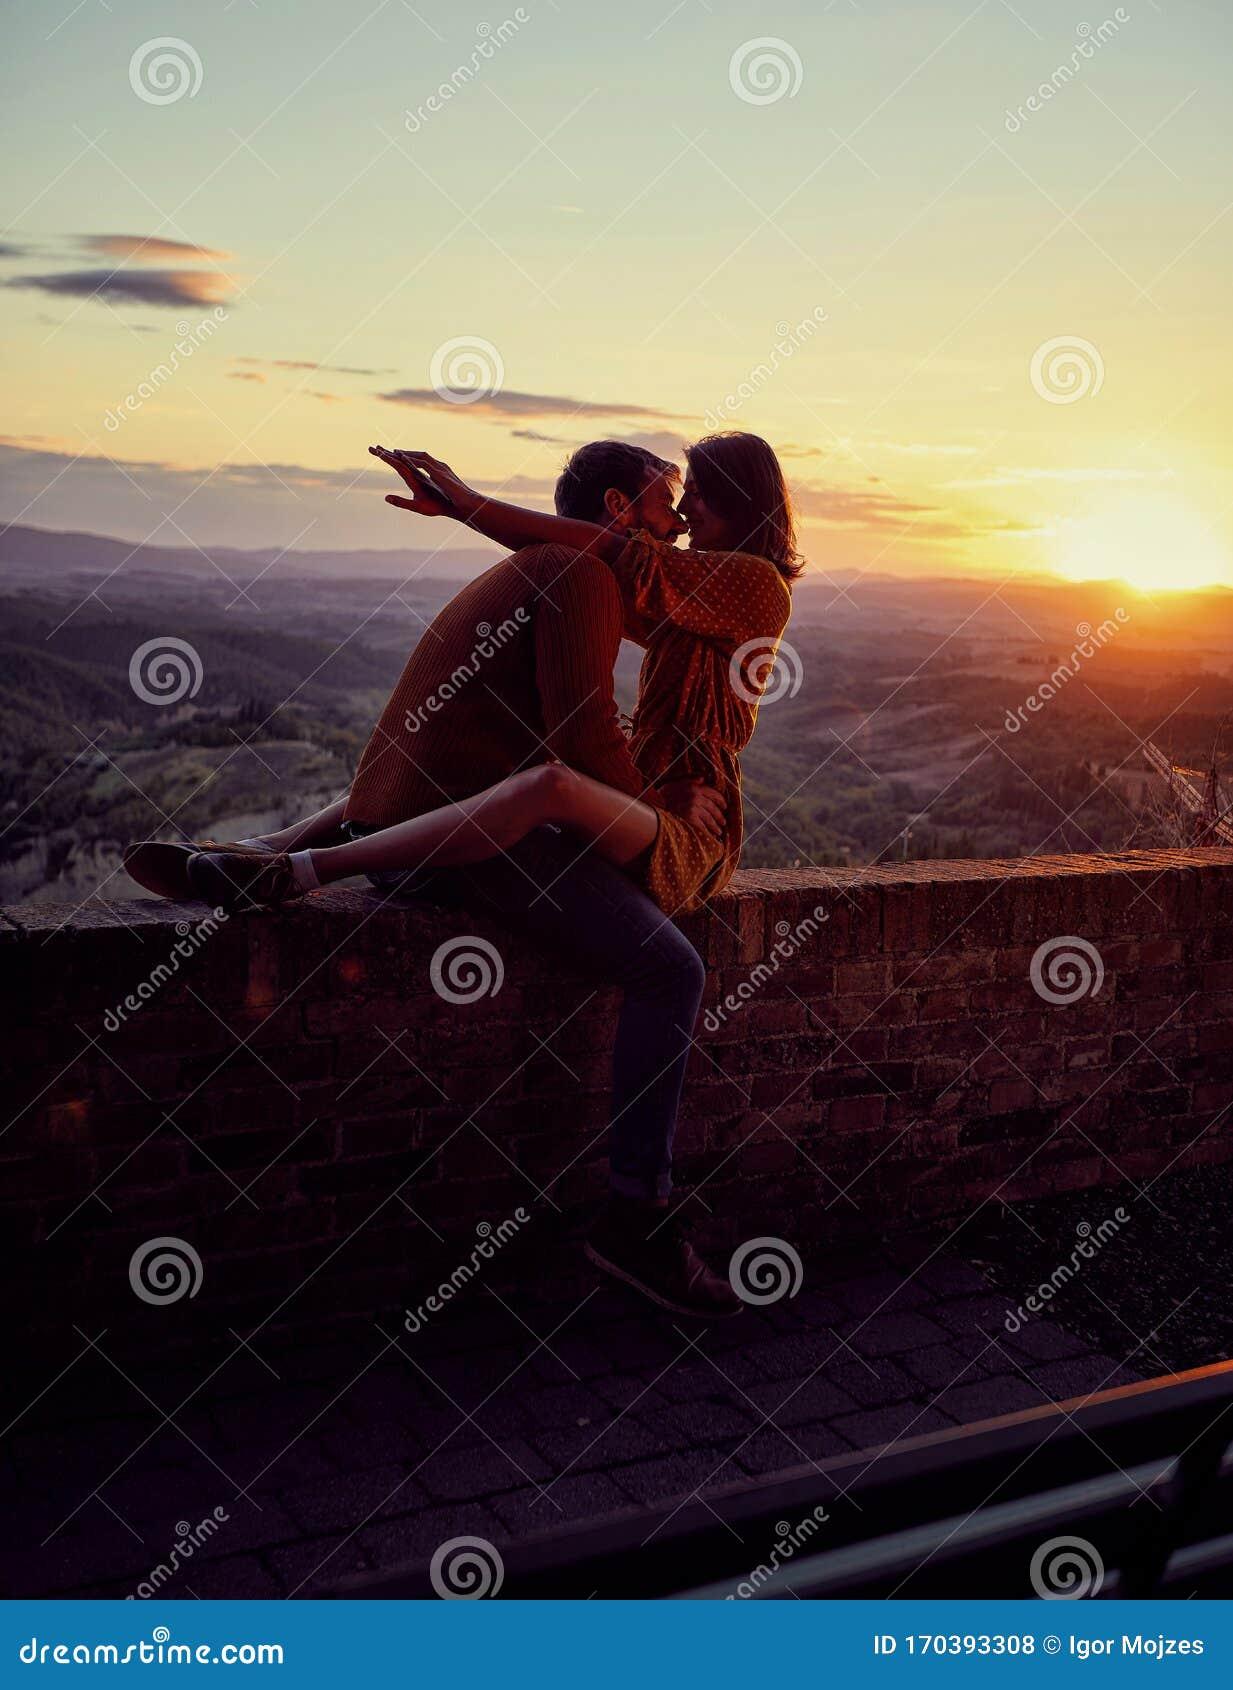 dating service in orlando